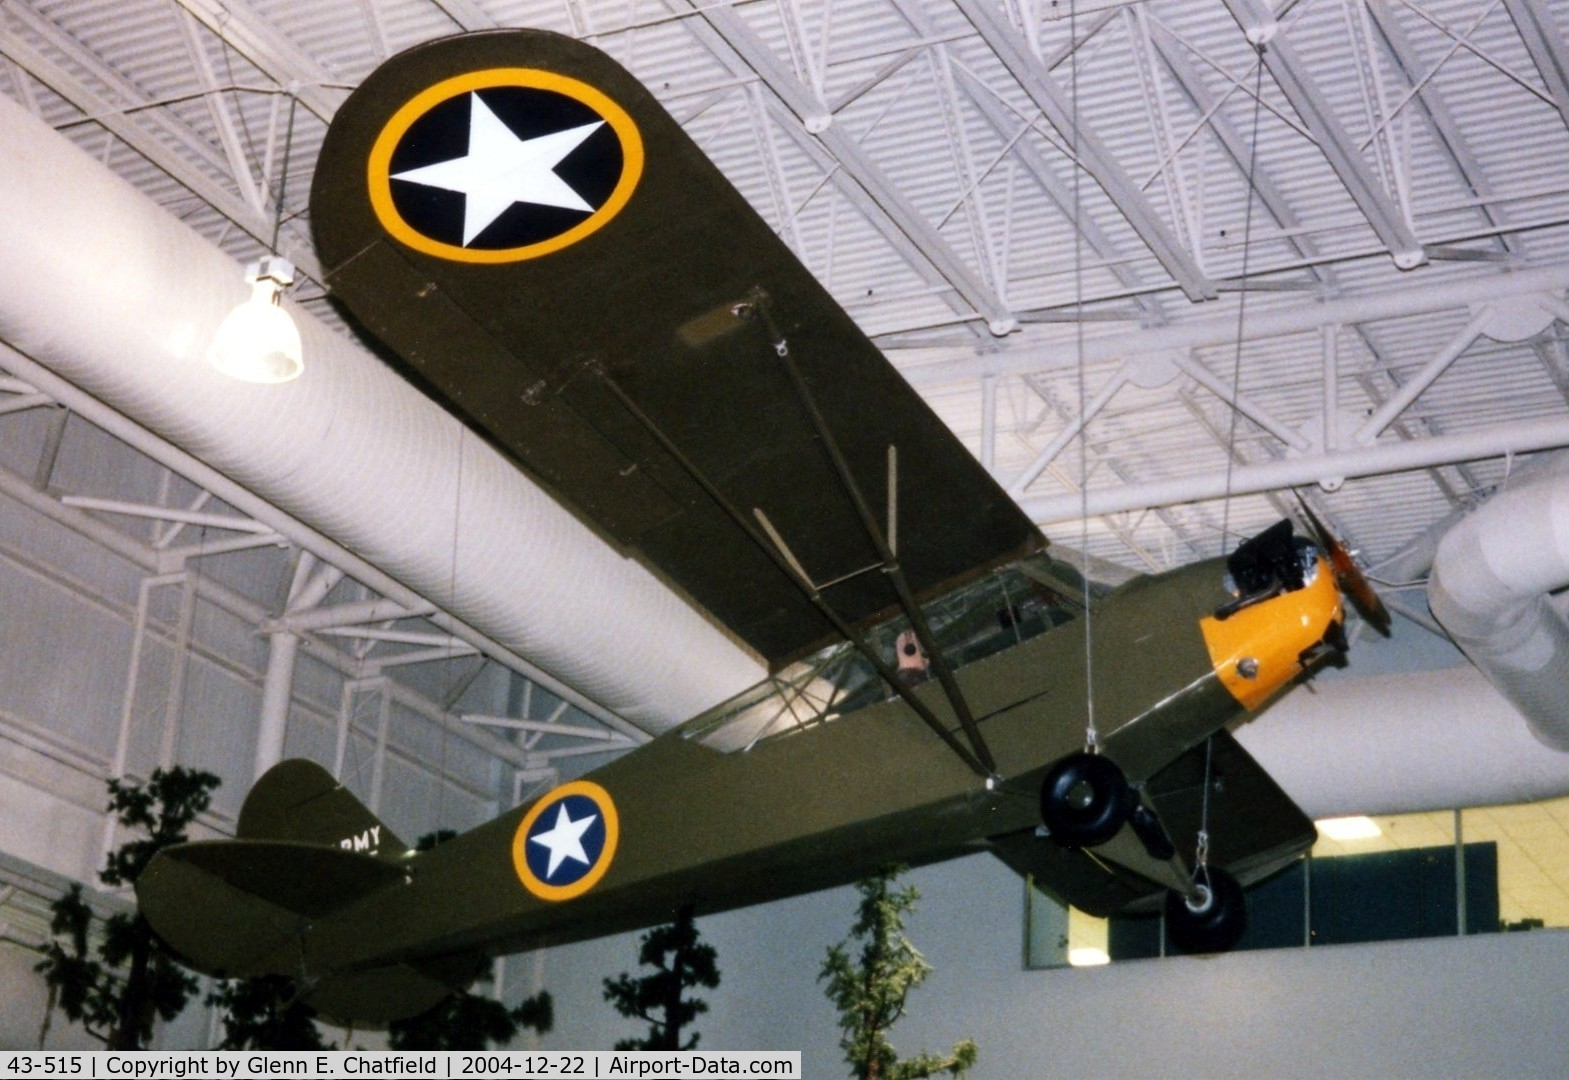 43-0515, 1943 Piper L-4B Grasshopper C/N 9376, L-4B at the Army Aviation Museum